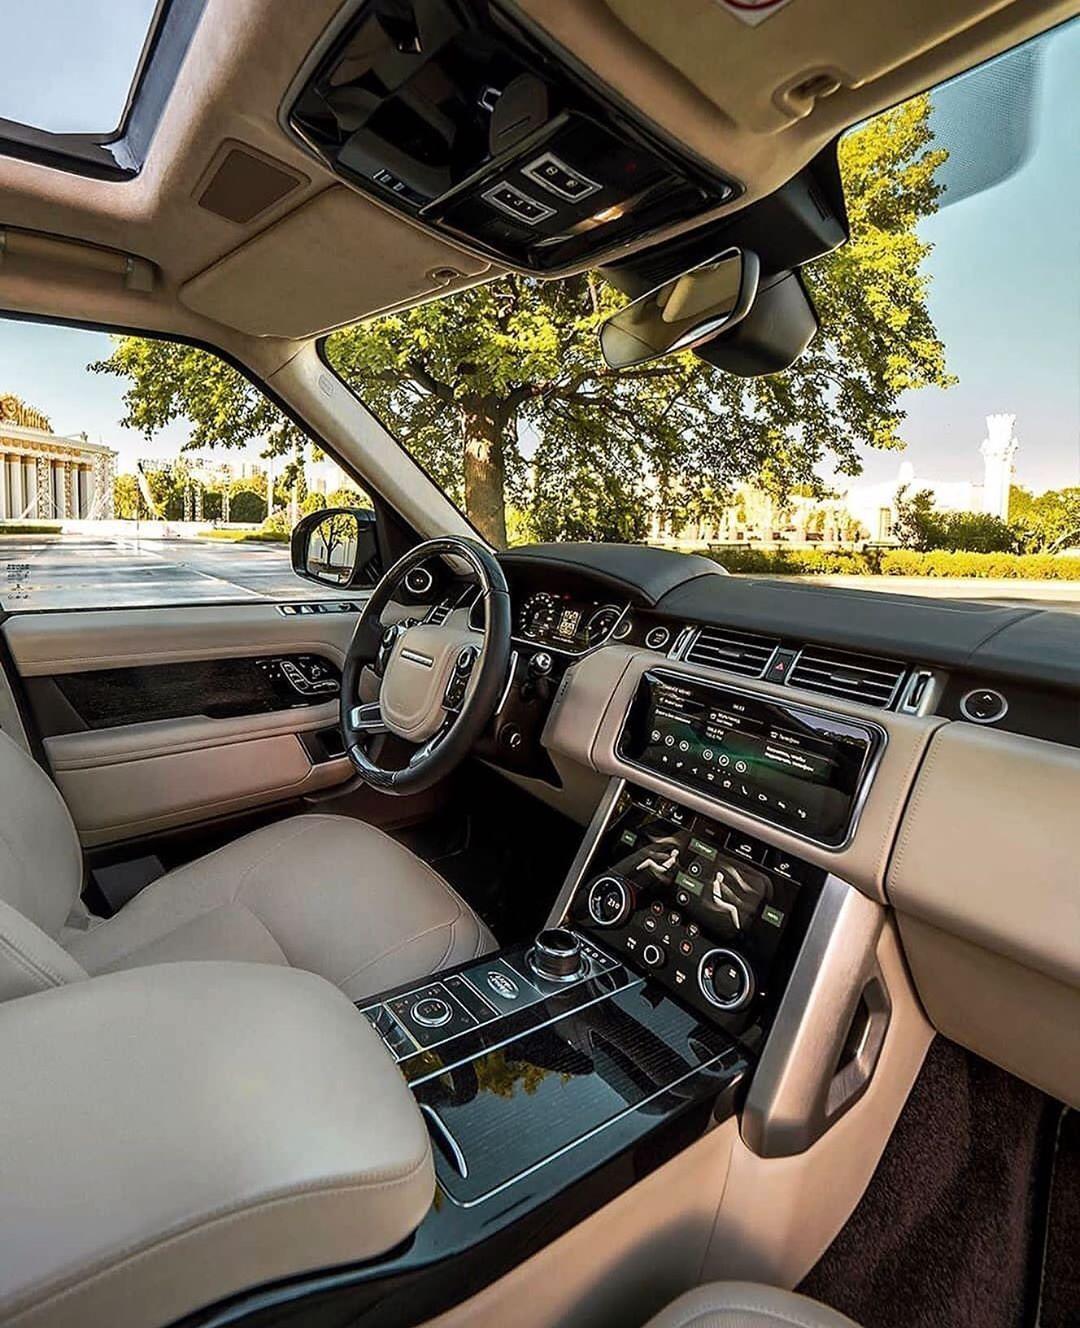 Land Rover Range Rover in 2020 Luxury cars range rover